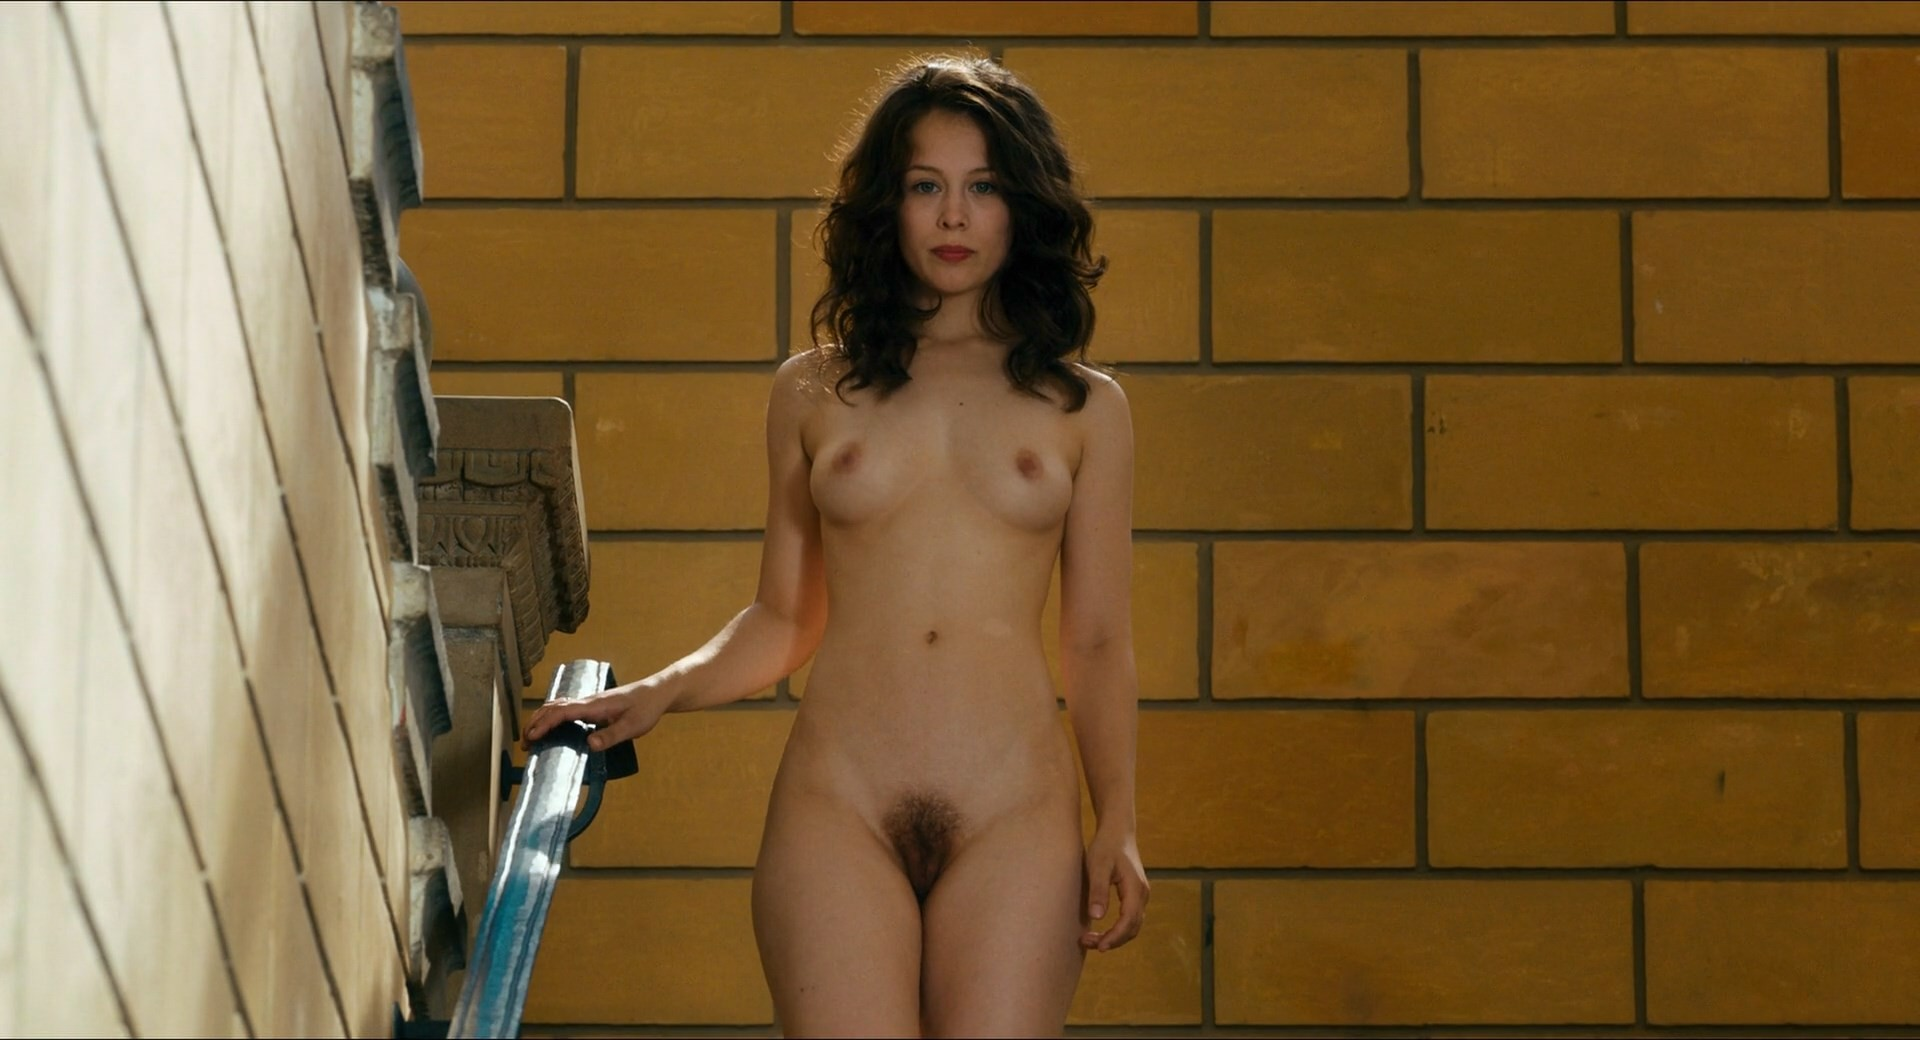 Tiasha lorrin sexy body in full frontal nude photoshoot by jeffrey thomas